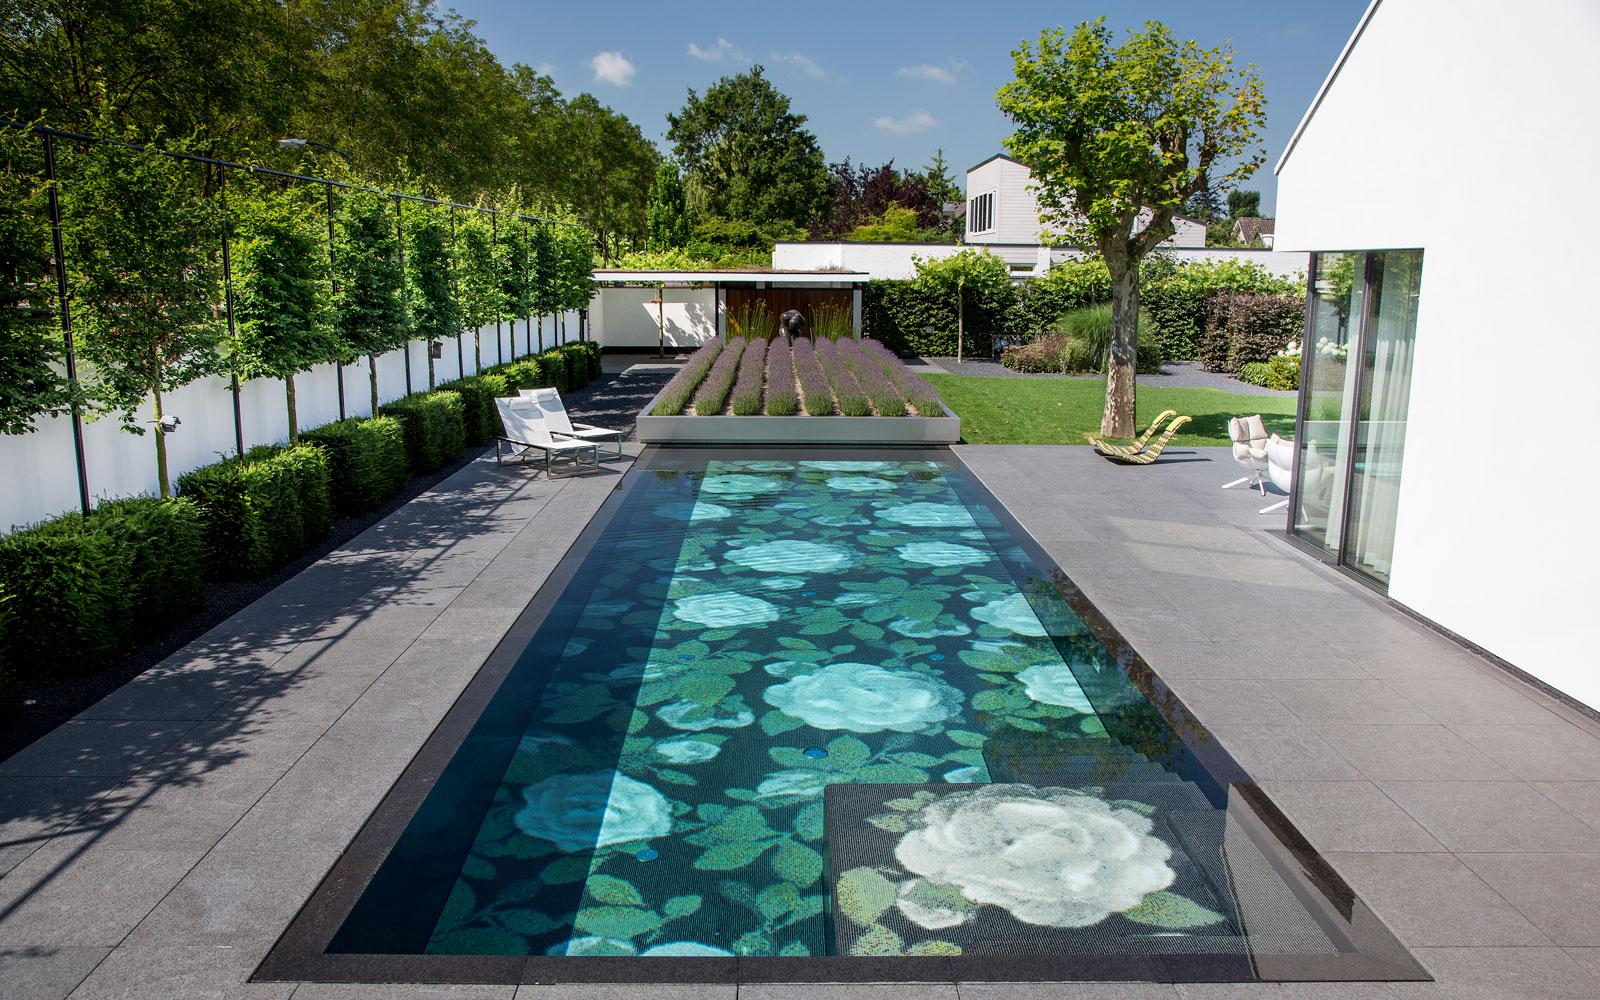 Thuis een buitenzwembad, ambiance, ambiance premium wellness, buitenzwembad